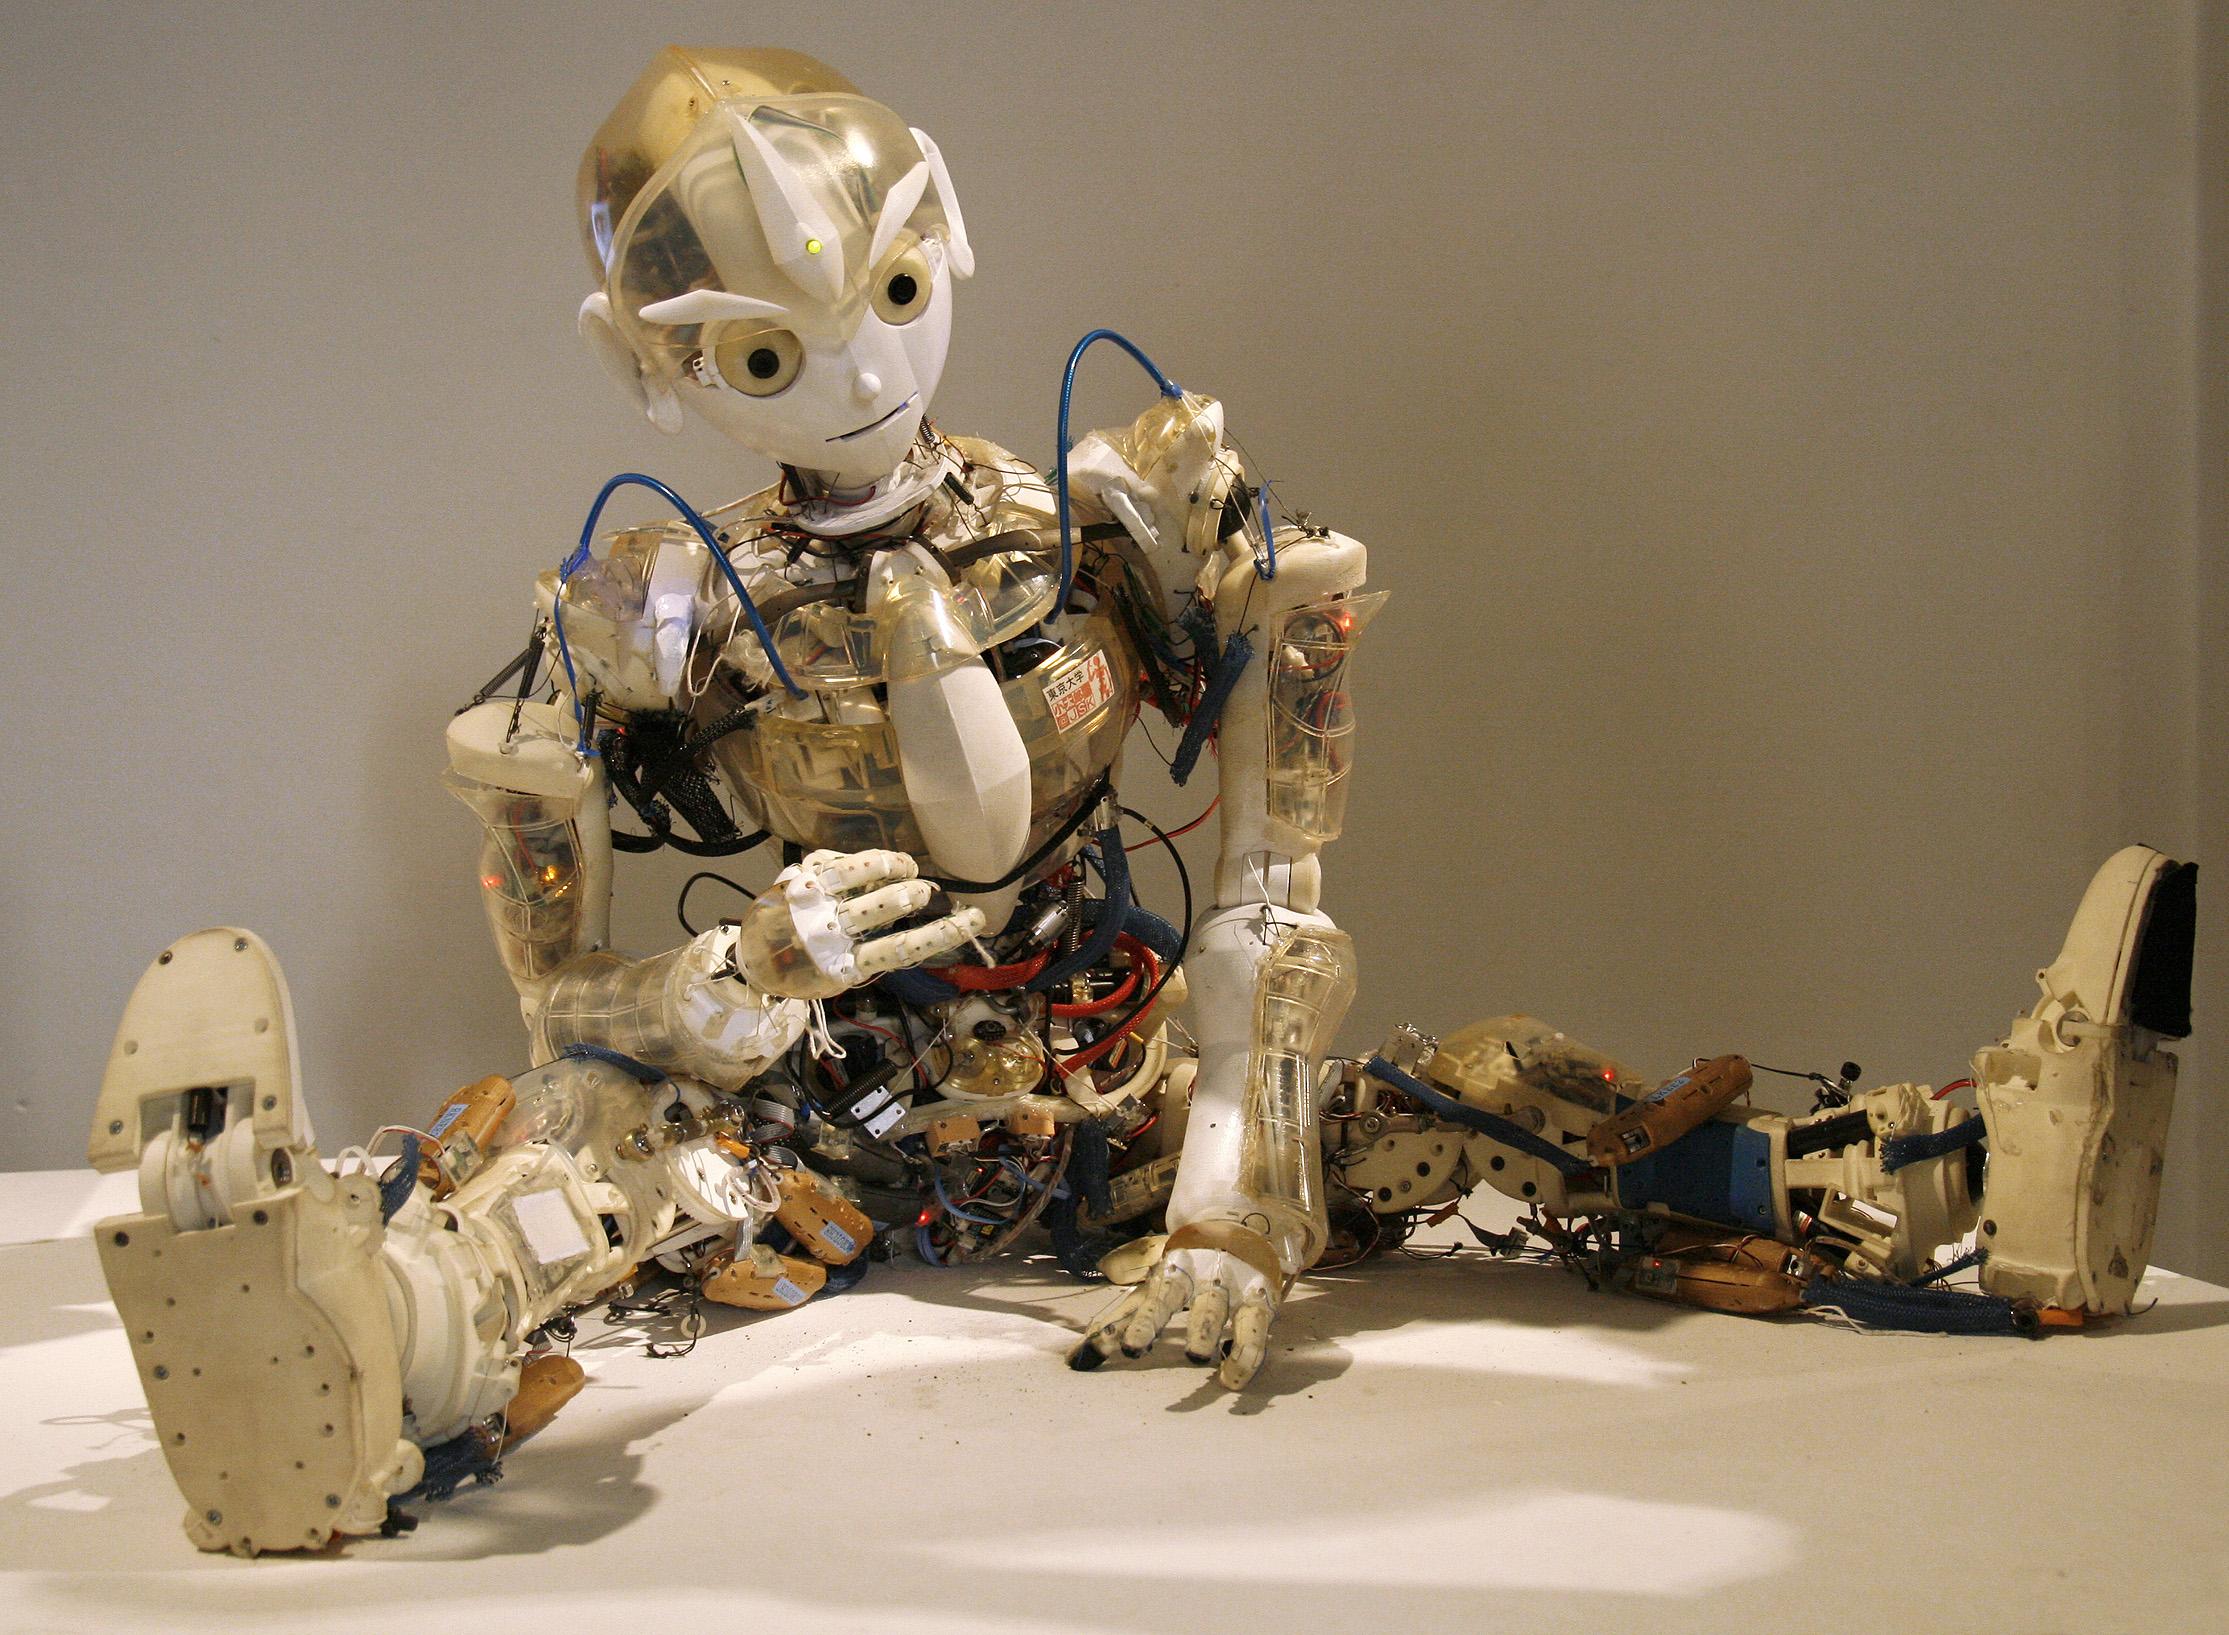 Podcast: Transhumanisme, vers un être humain 2.0?